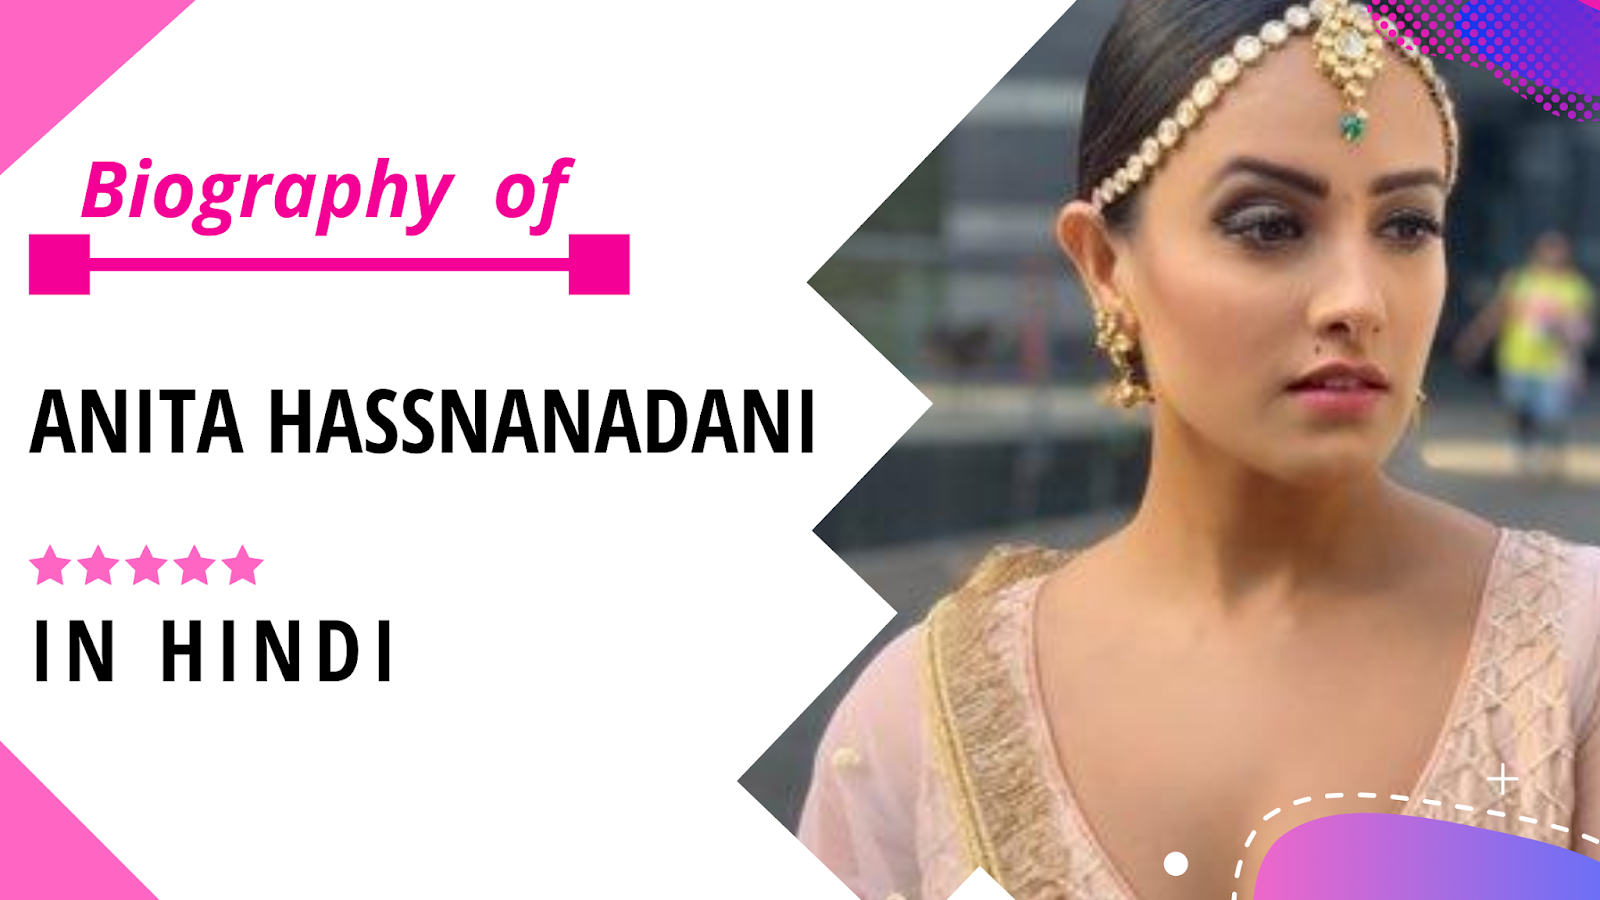 Anita Hassanandani biography & lifestyle in hindi -